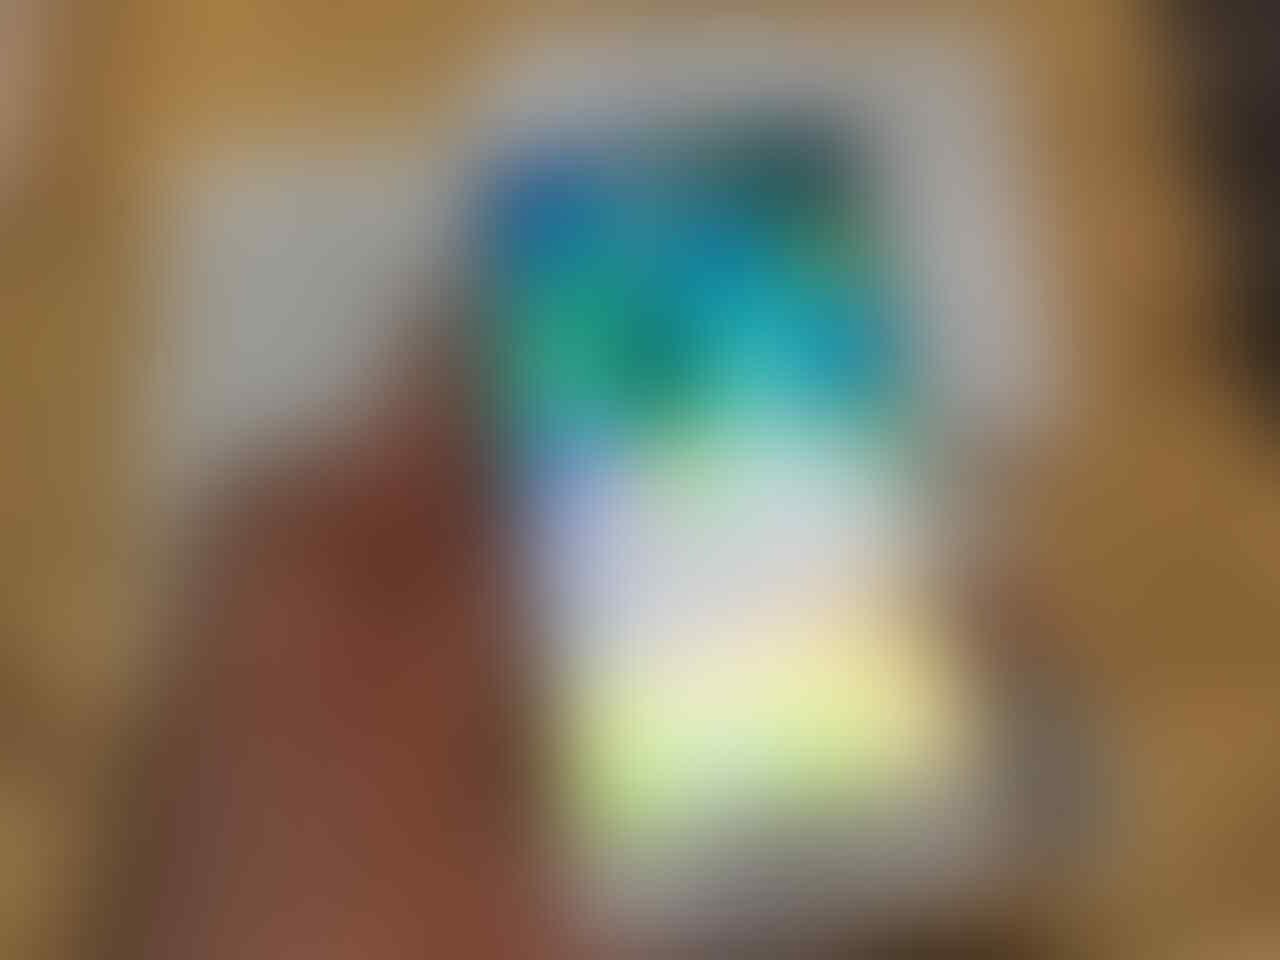 IPHONE 6S ROSEGOLD 16GB FU FULLSET MULUUSS NORMAL MURAAHH 3200 SAJA [MALANG]